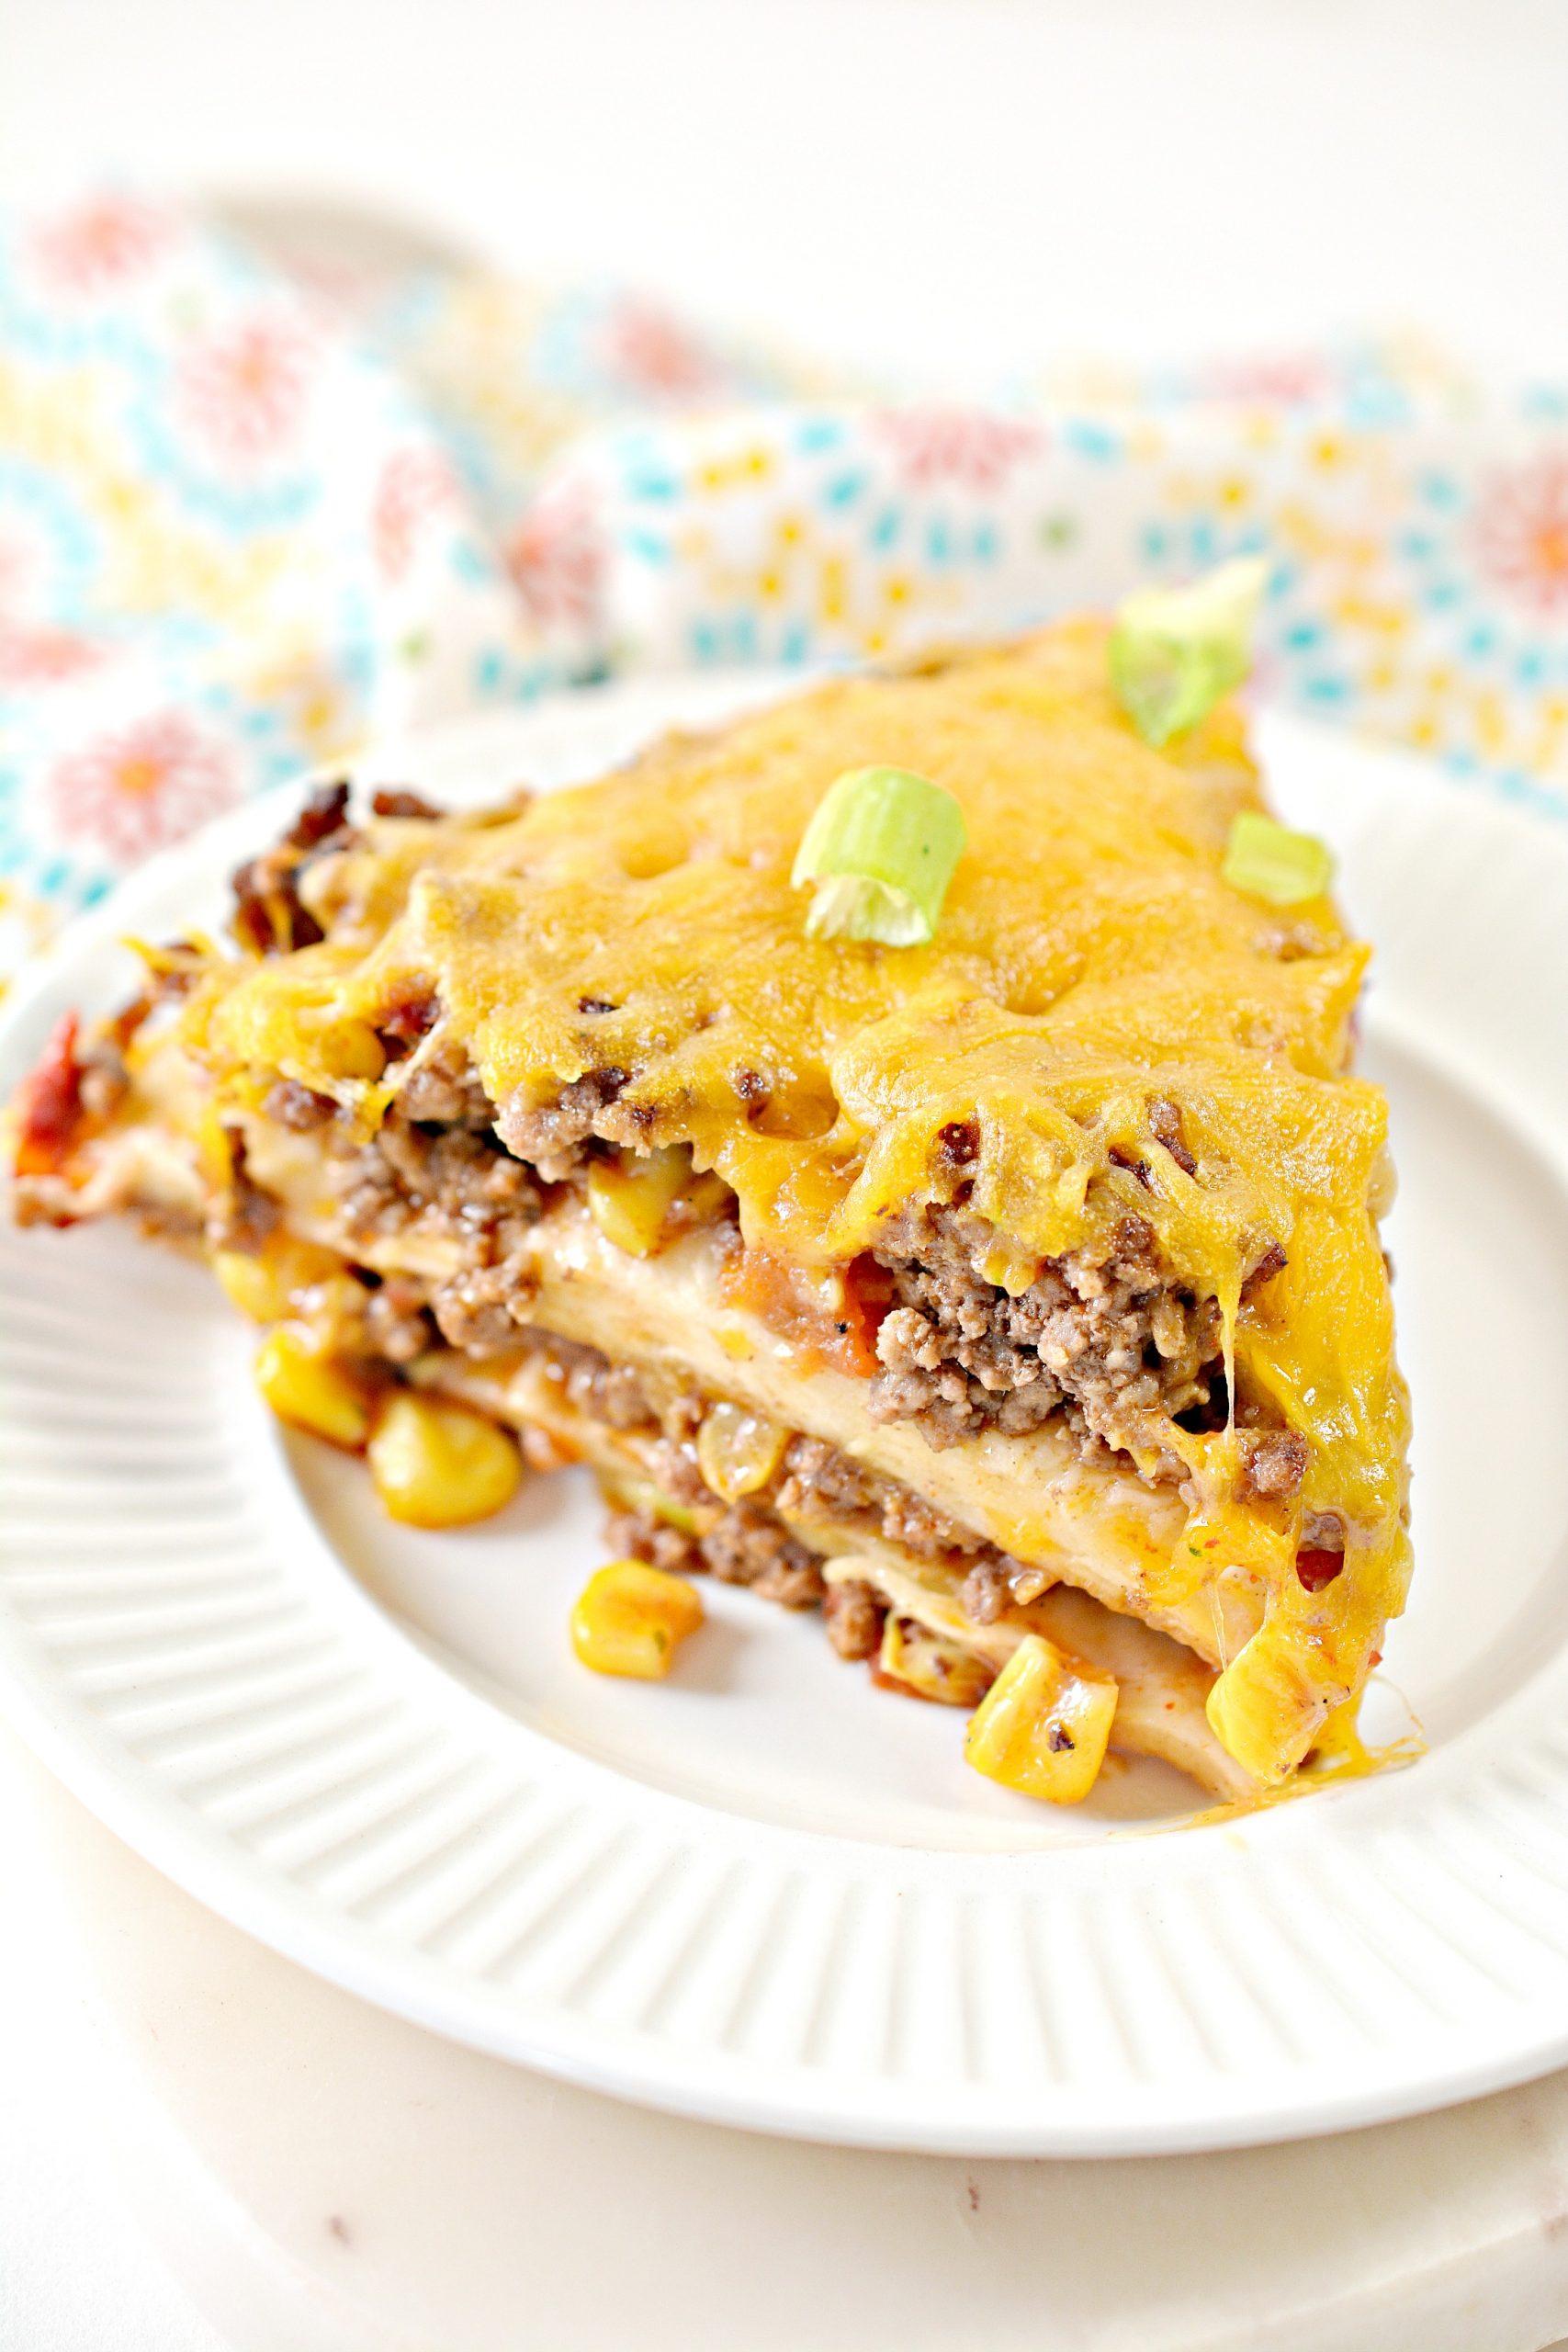 Weight Watchers Friendly Taco Pie